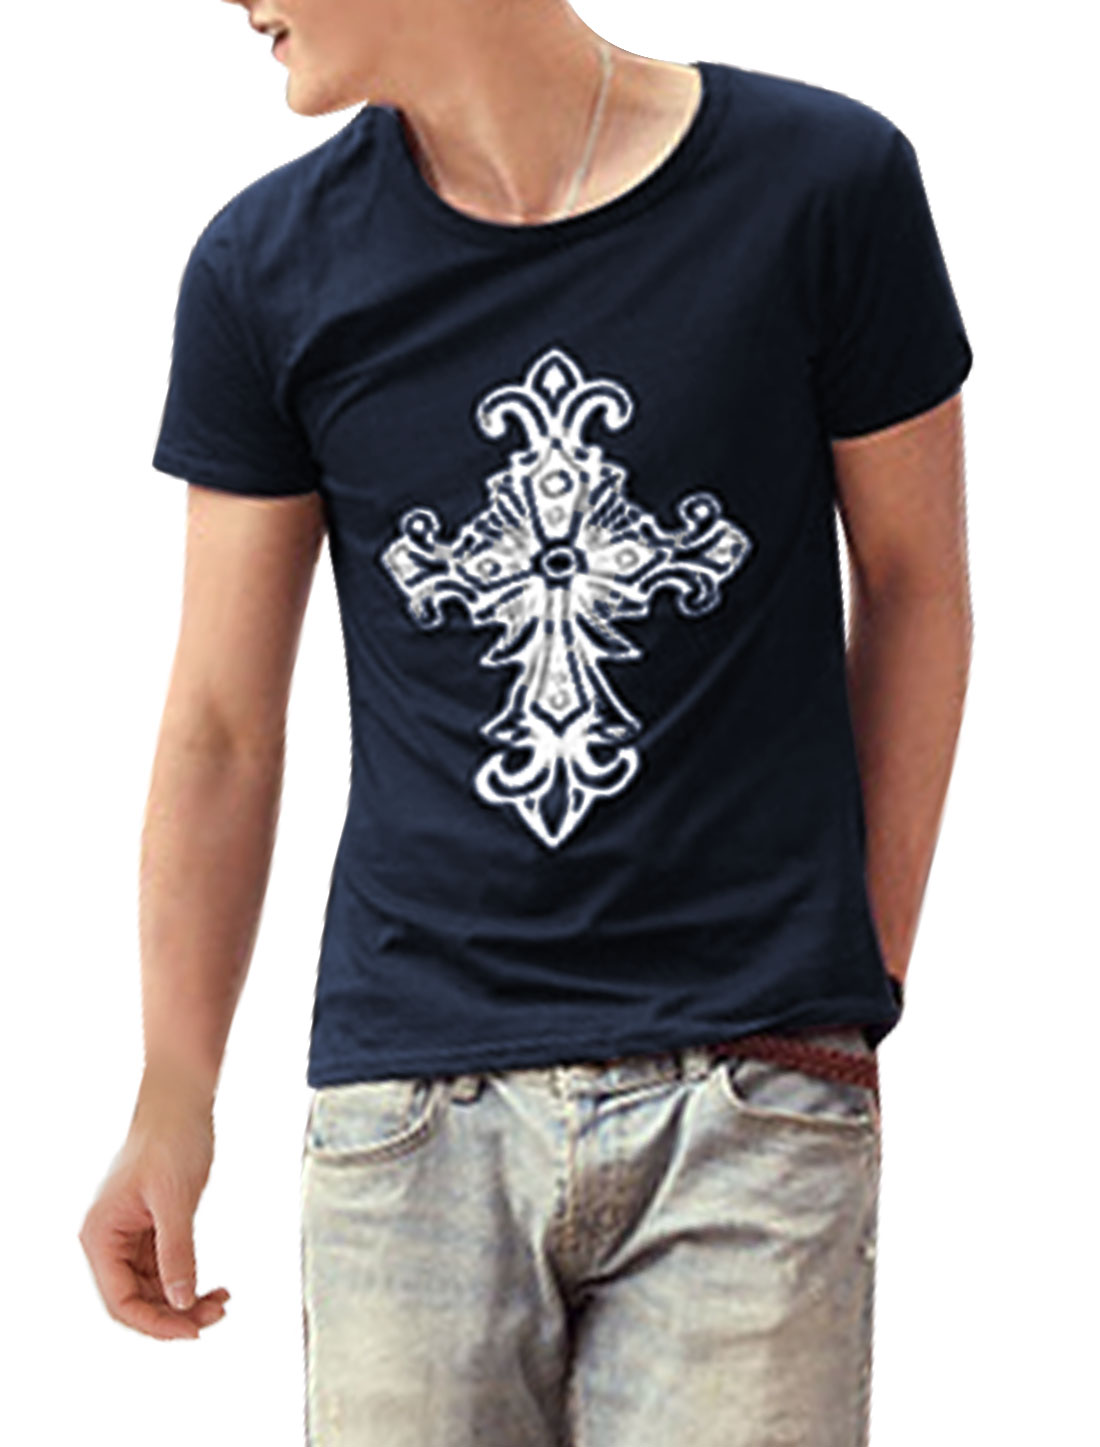 Men Short Sleeve Pullover Cross Pattern Stylish Top Shirt Navy Blue M